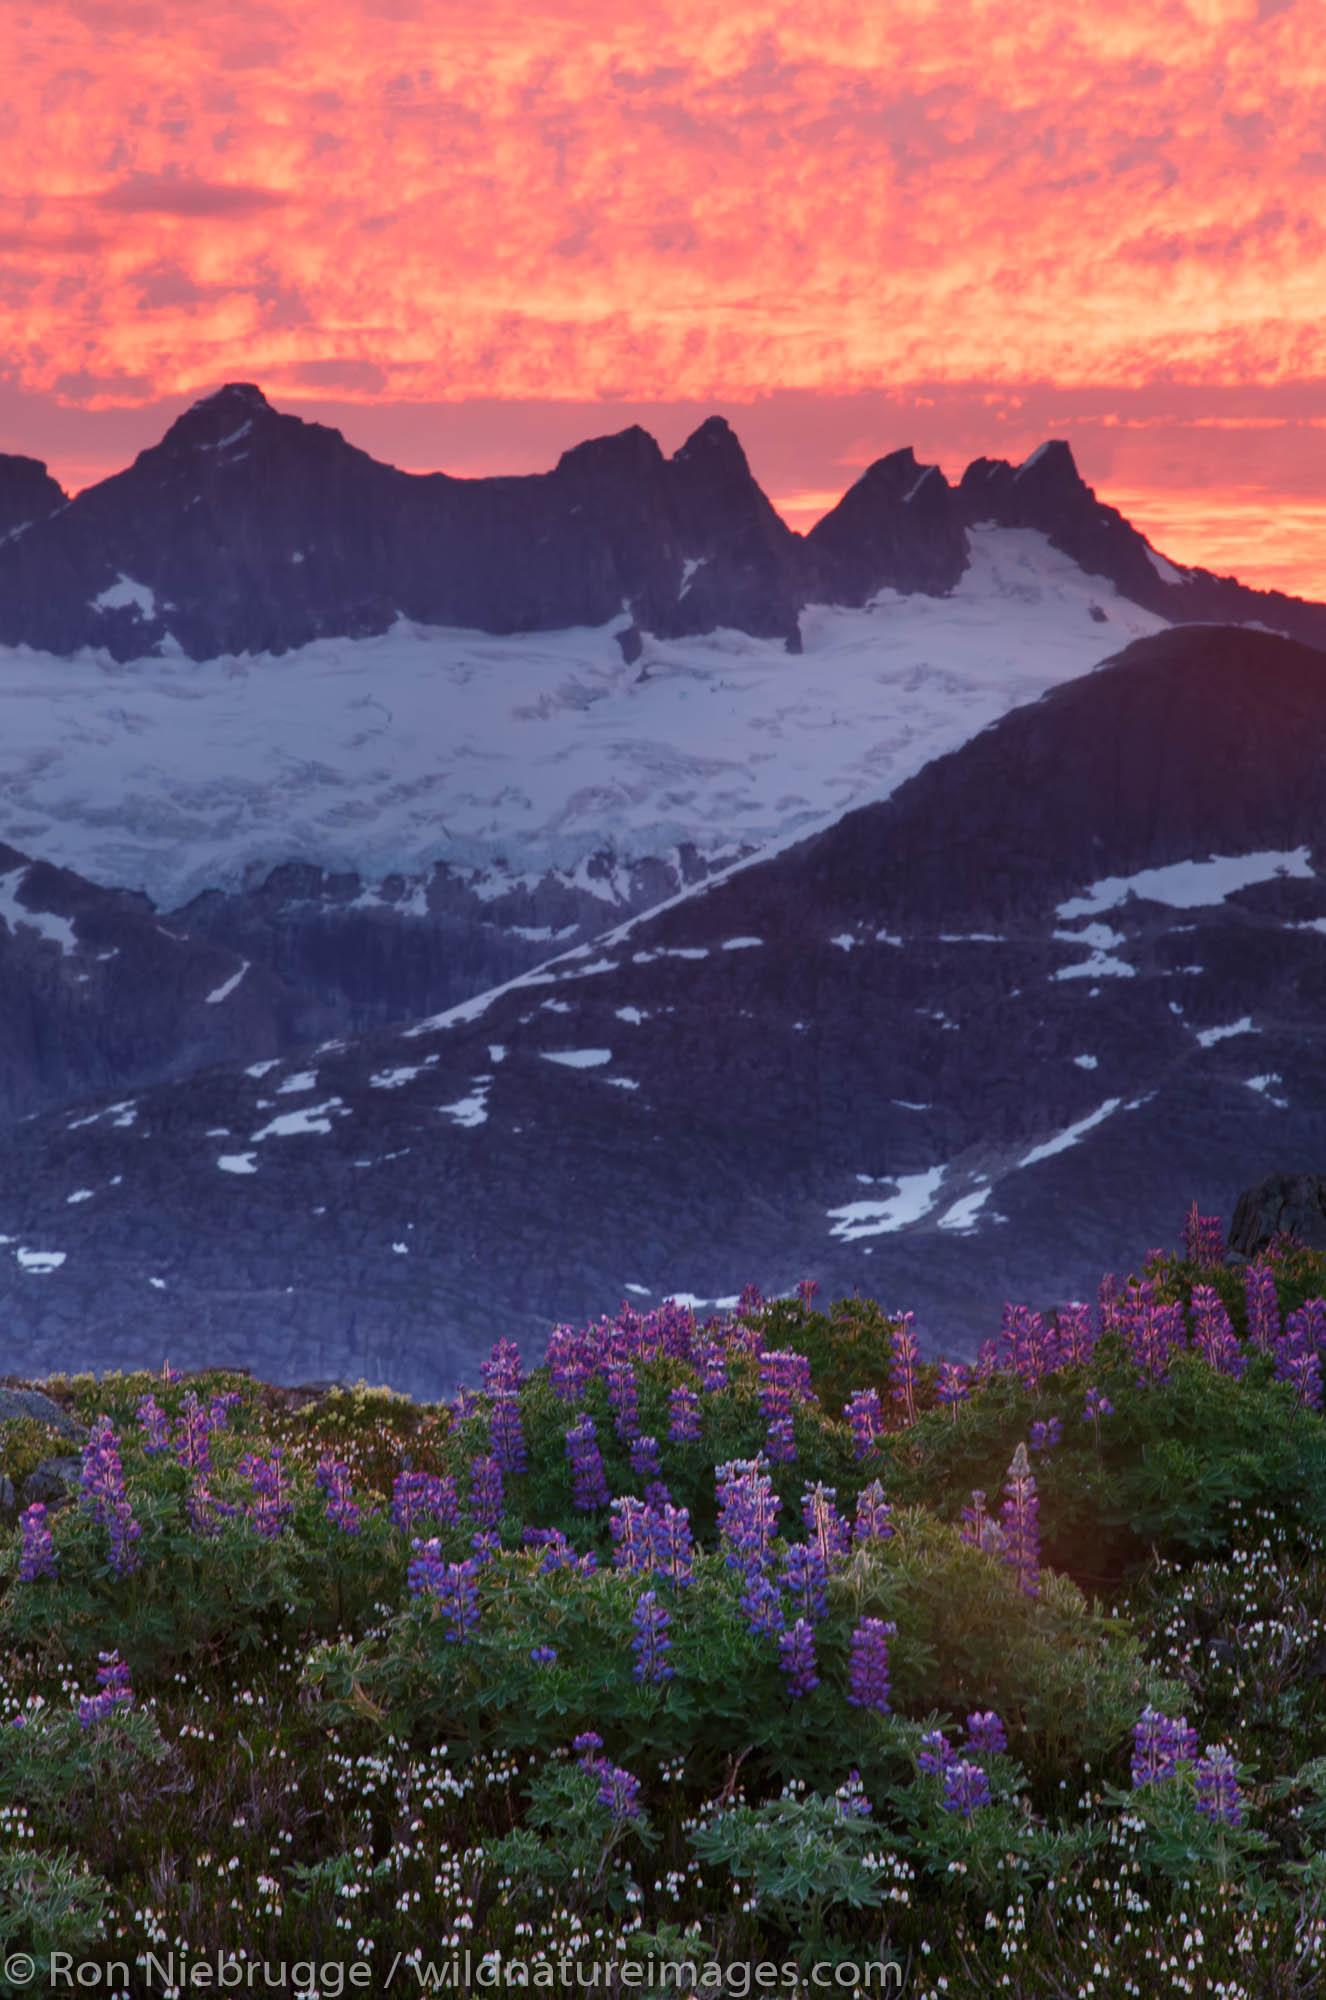 Sunrise From Mount Stroller White above the Mendenhall Glacier, Tongass National Forest, Alaska.